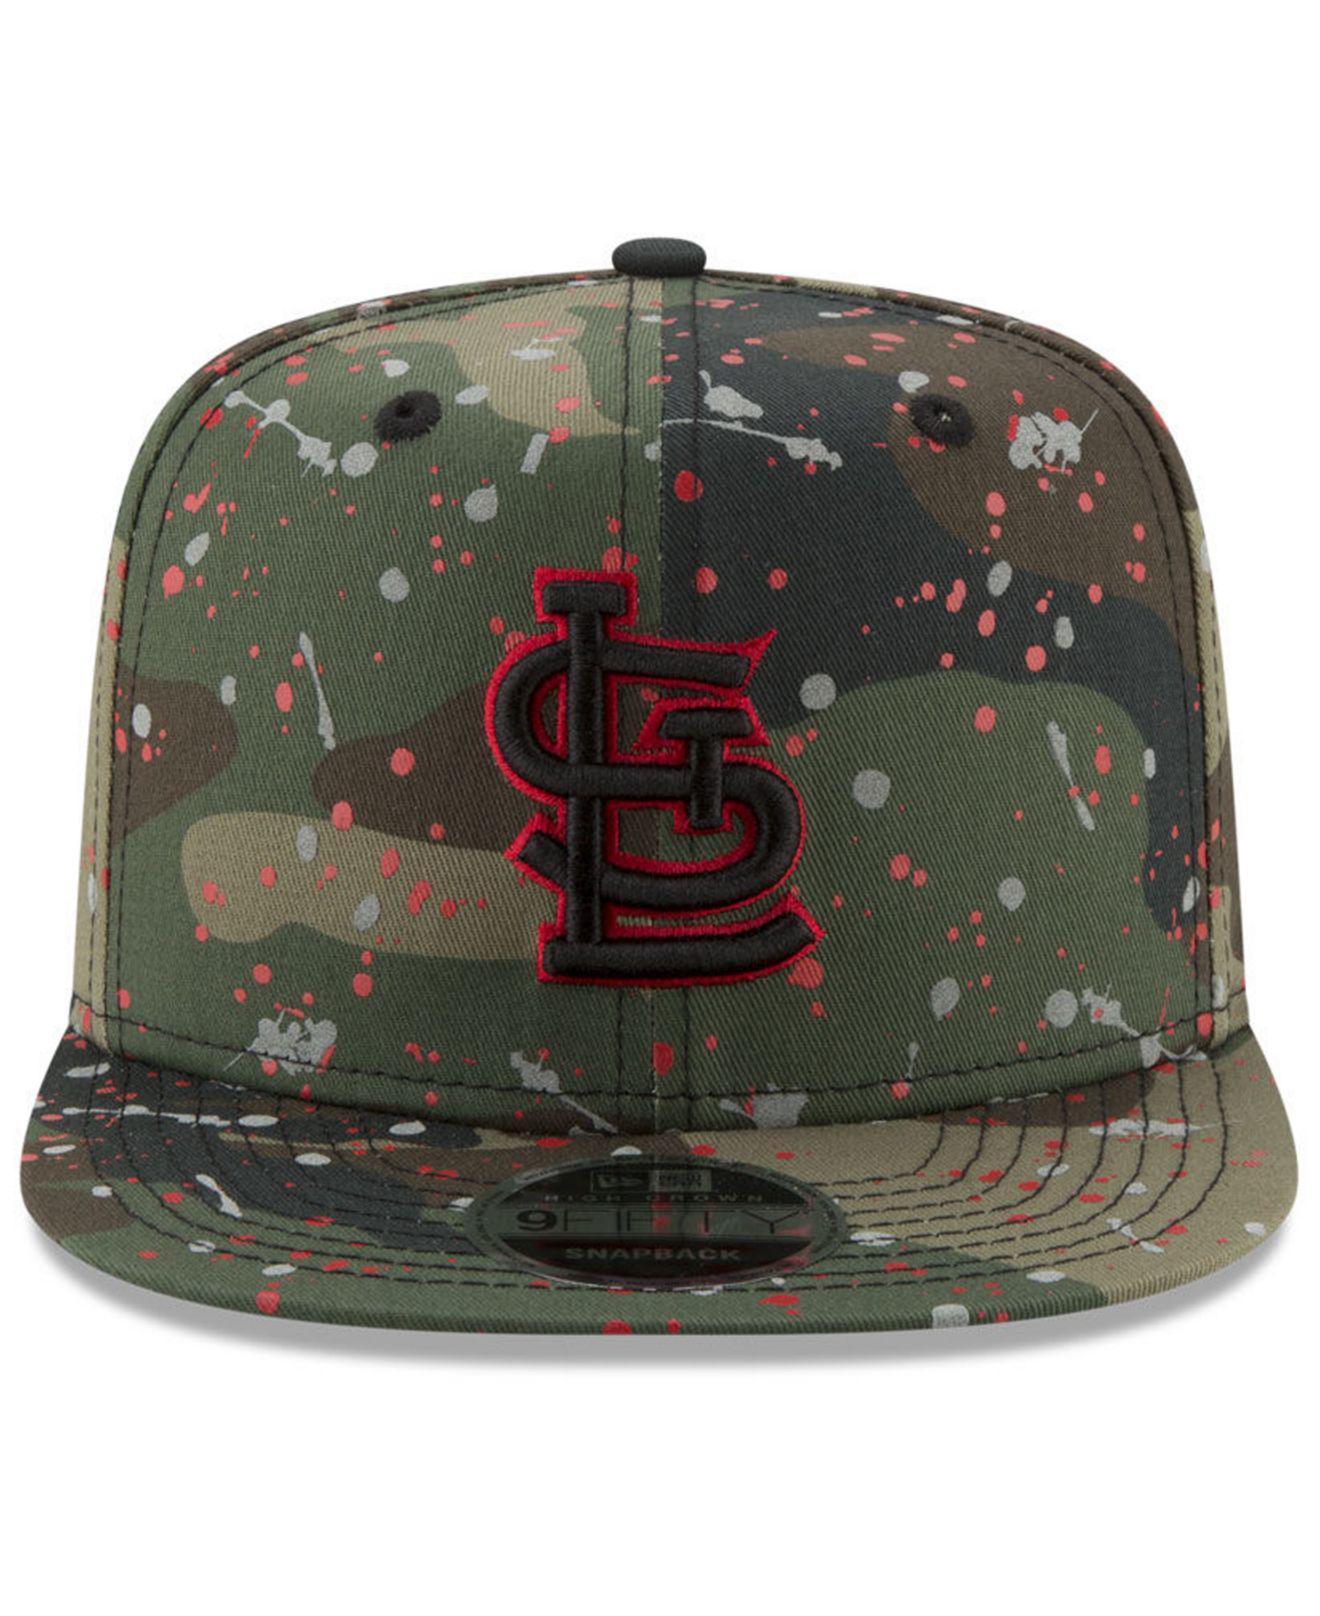 Lyst - Ktz St. Louis Cardinals Camo Spec 9fifty Snapback Cap in Green for  Men 66818110dd6d